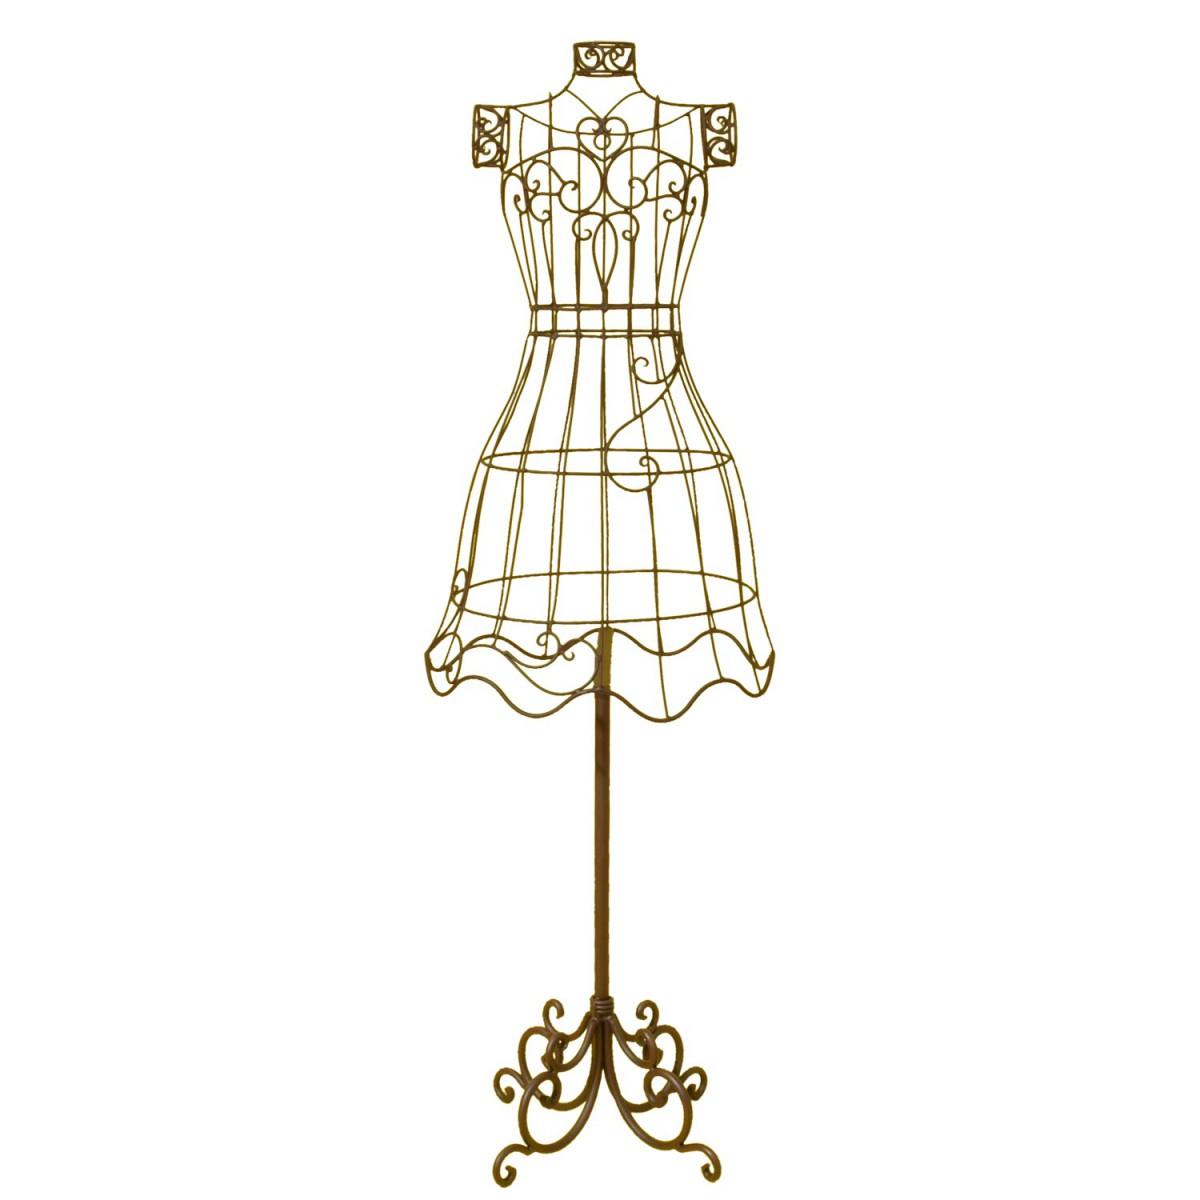 clayre eef mannequin schneiderpuppe b ste aus metall h he 1 3m. Black Bedroom Furniture Sets. Home Design Ideas